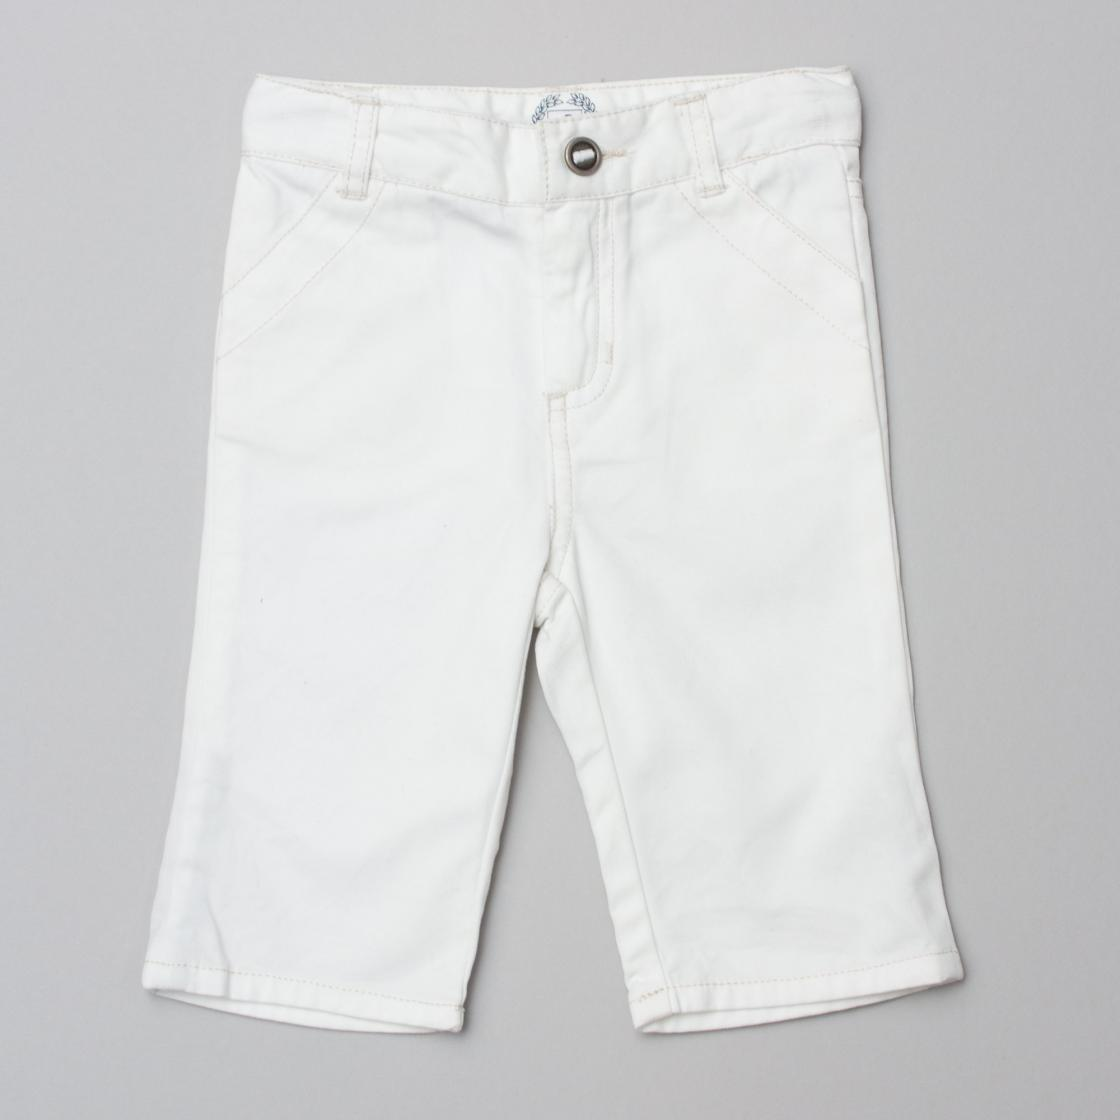 Jacadi White Pants